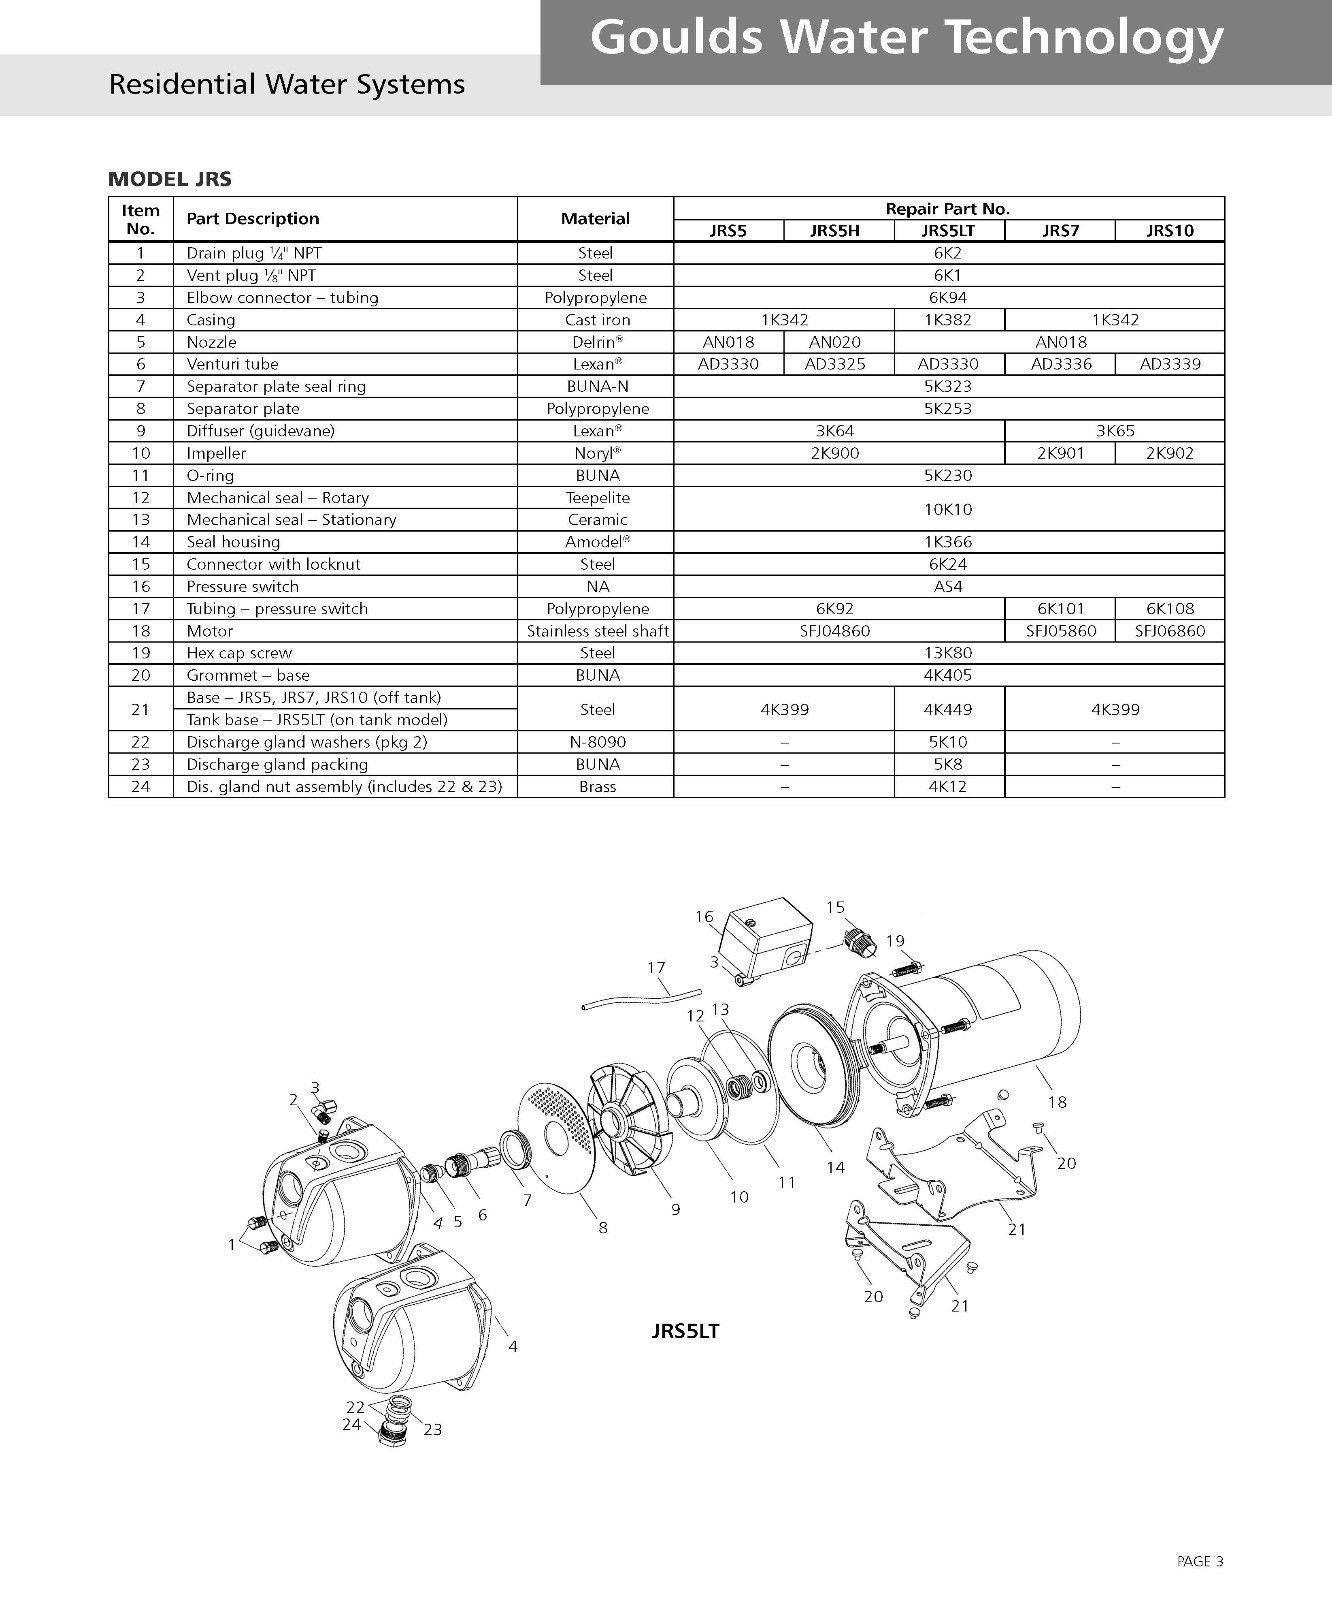 Goulds JRS5HKIT Repair Rebuild Kit for JRS5H by Goulds (Image #1)